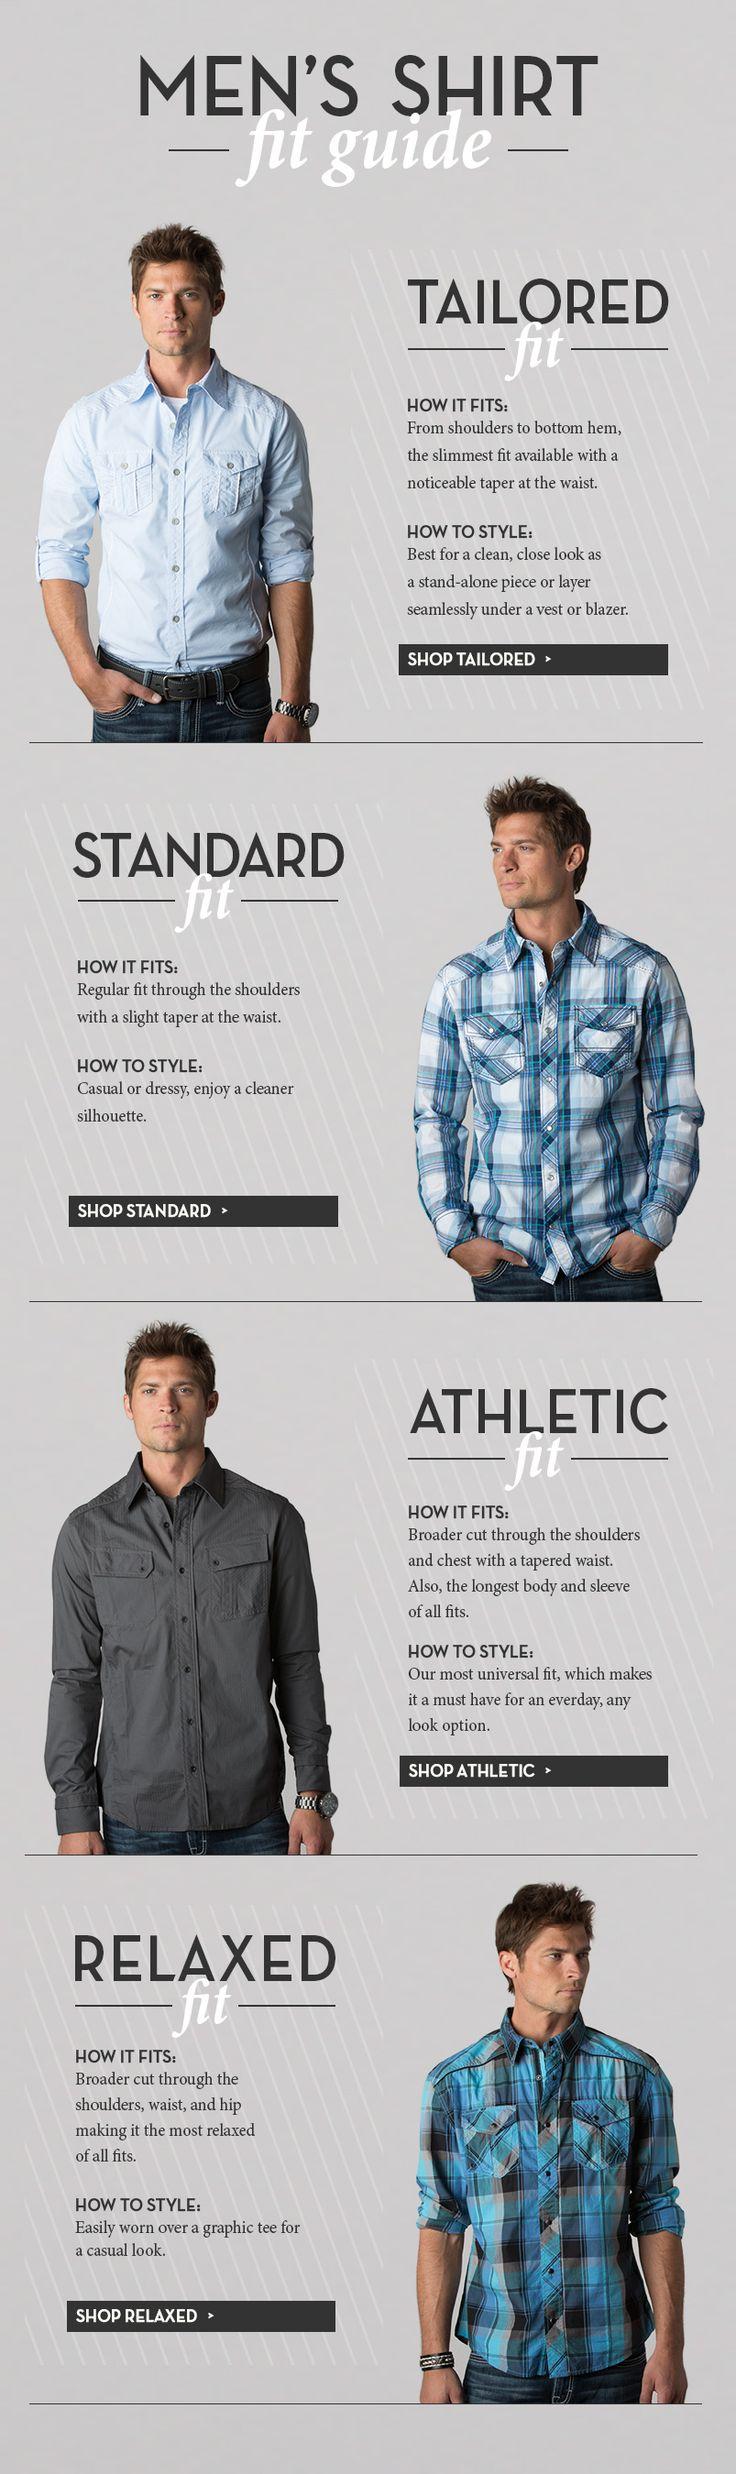 best menus fashion images on pinterest man style fashion